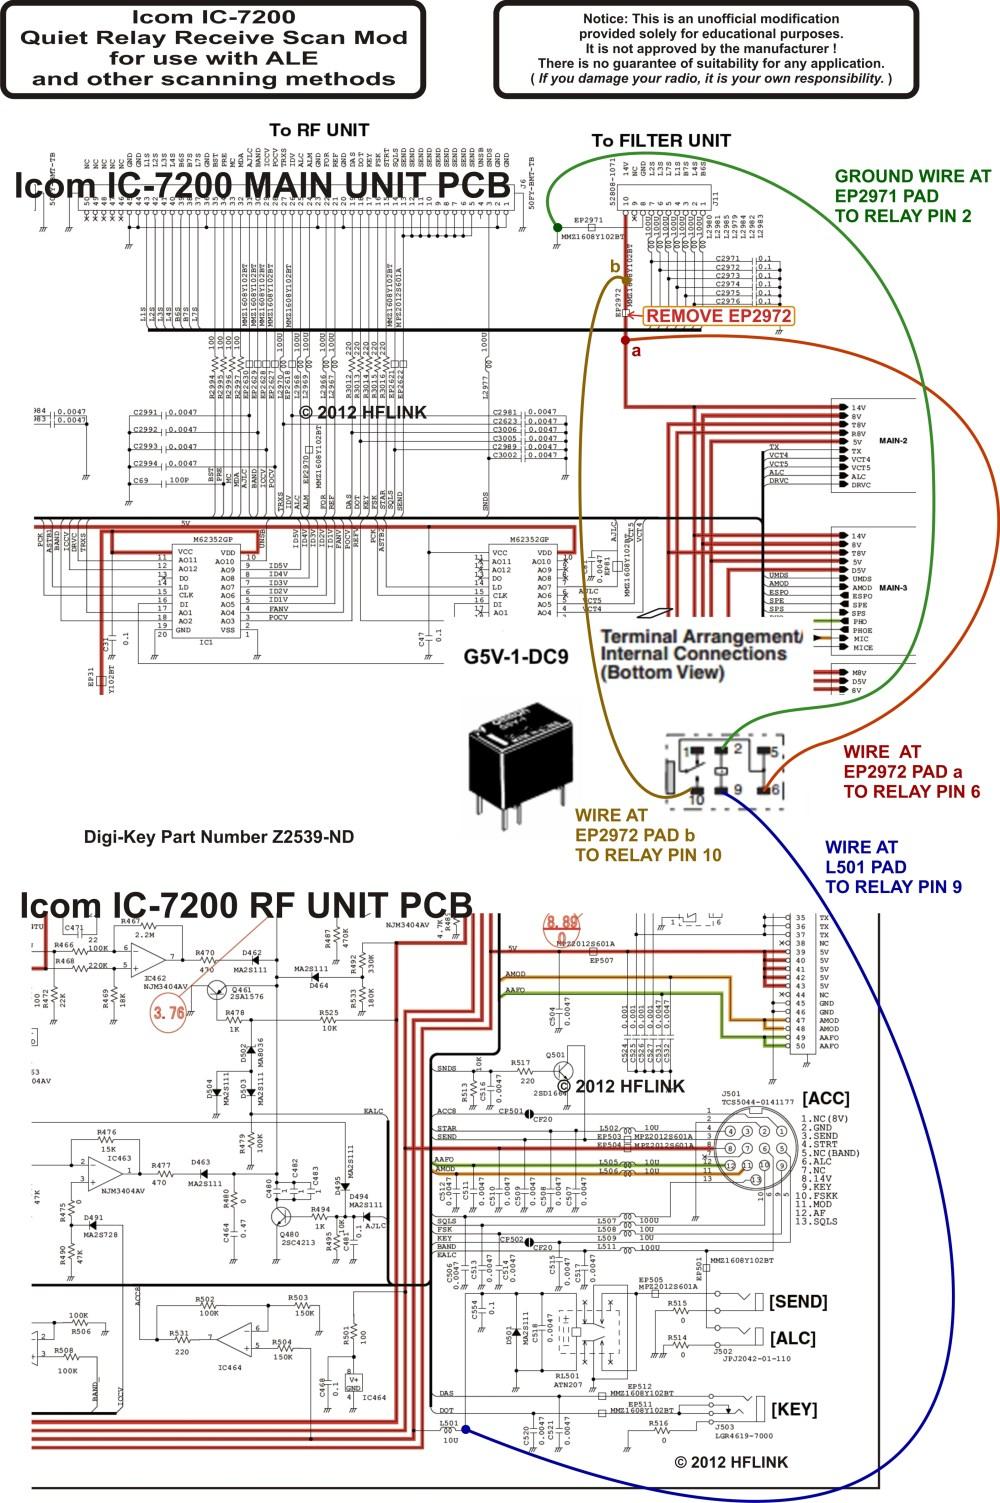 medium resolution of schematic icom ic 7200 quiet relay receive scan mod